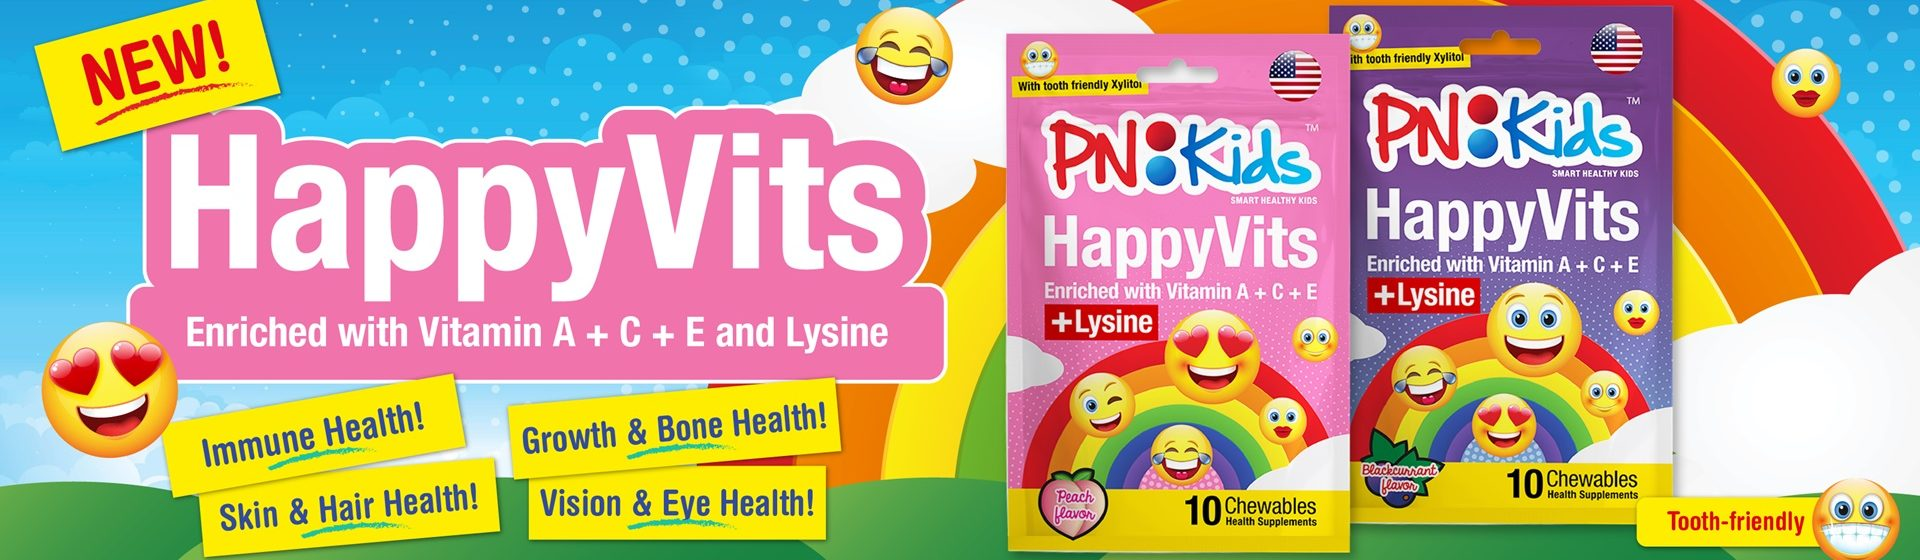 HappyVits